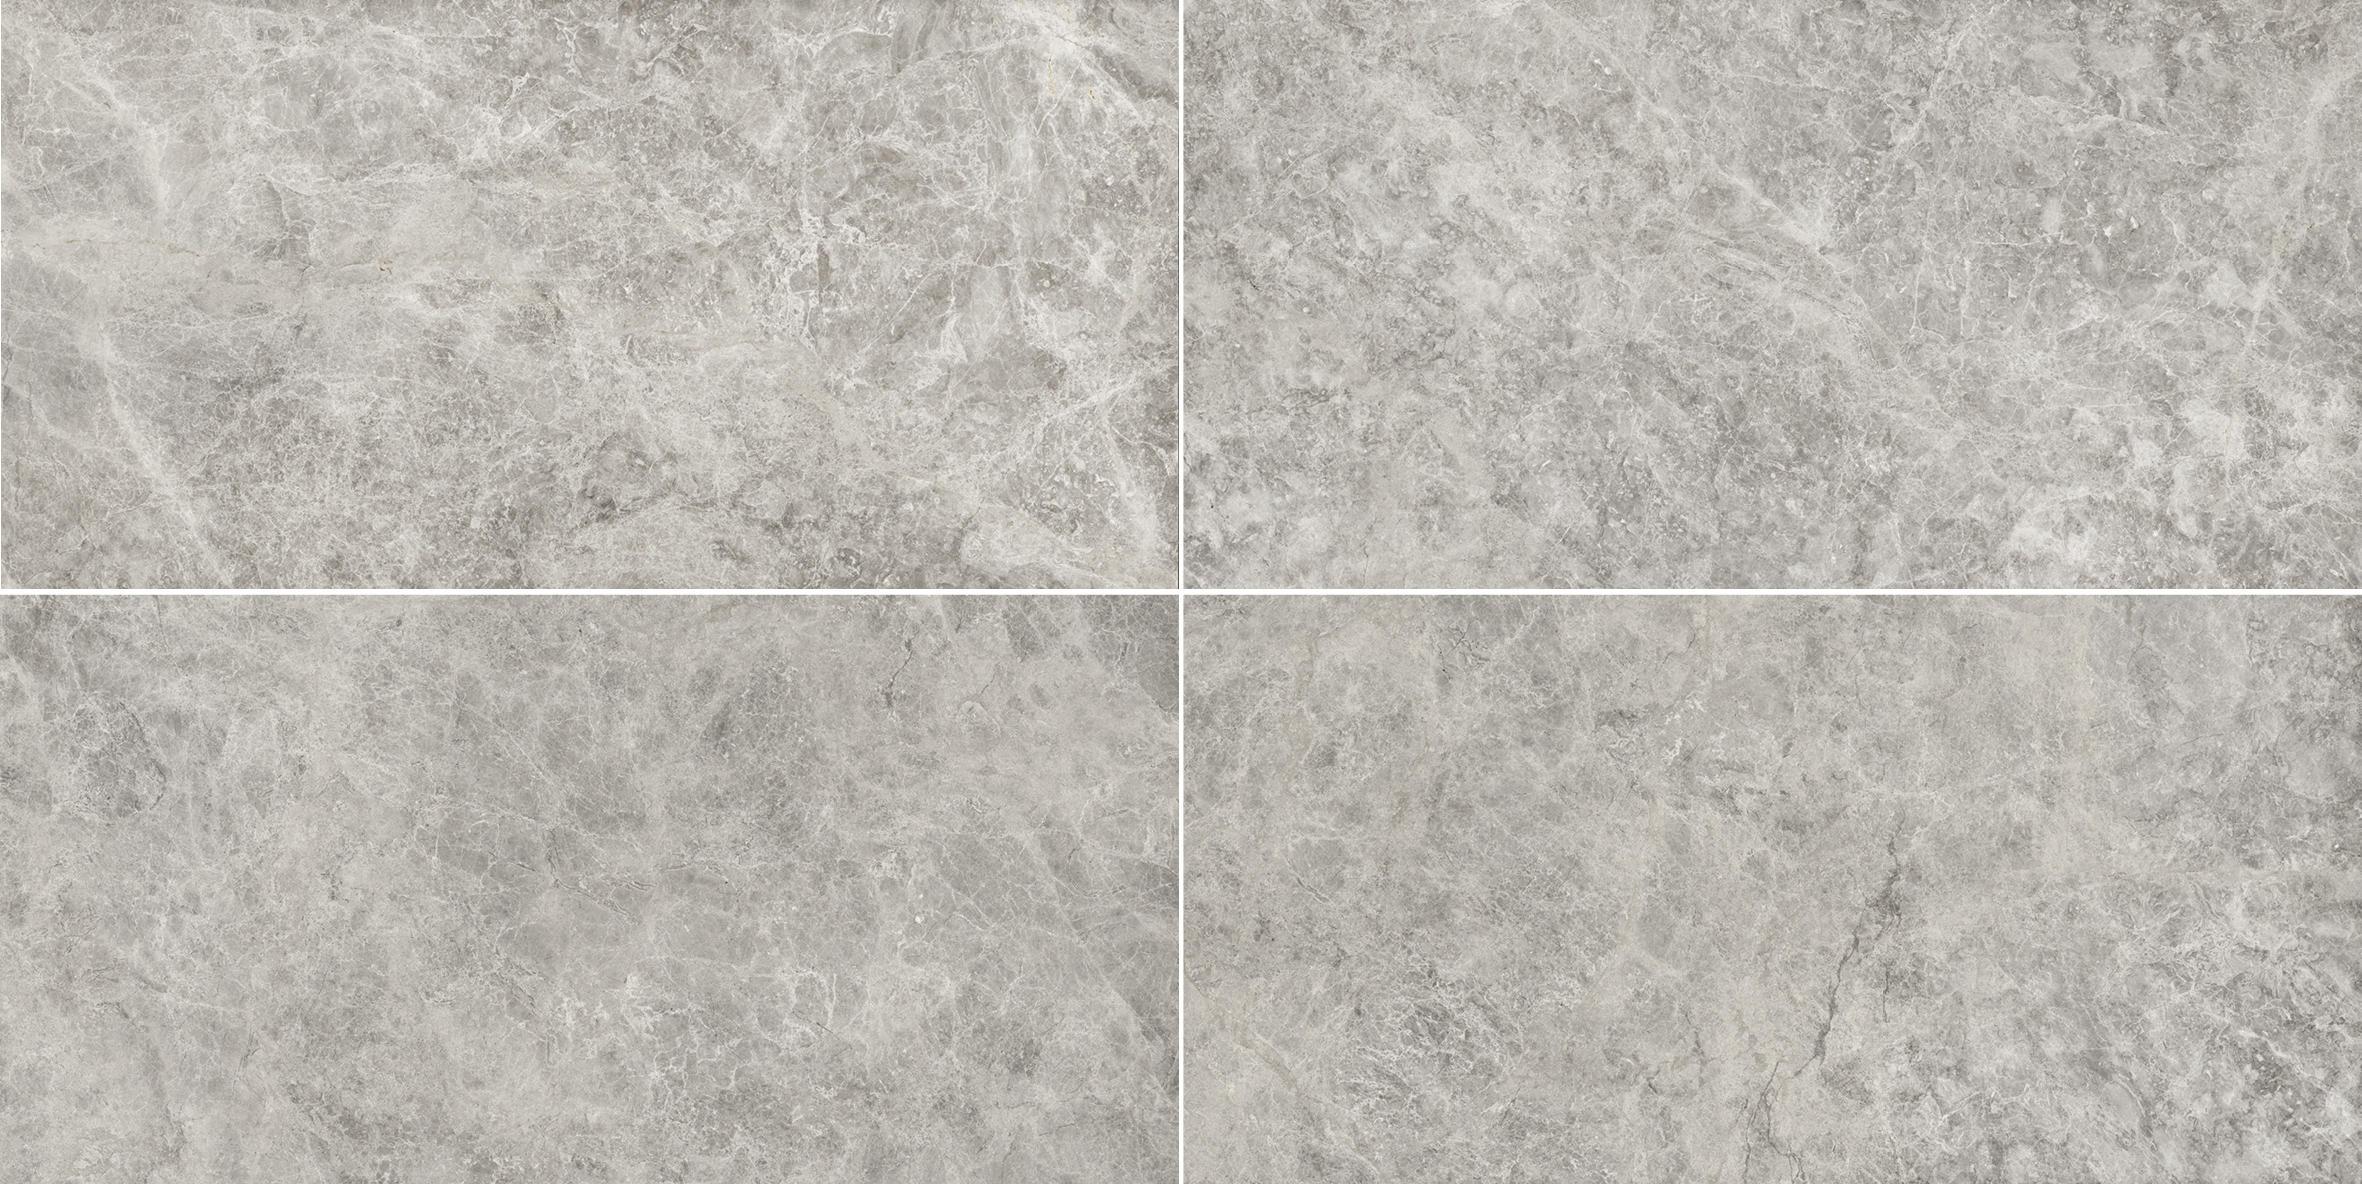 Big Slabs Madrid Silver Natural Stone Panels From Gani